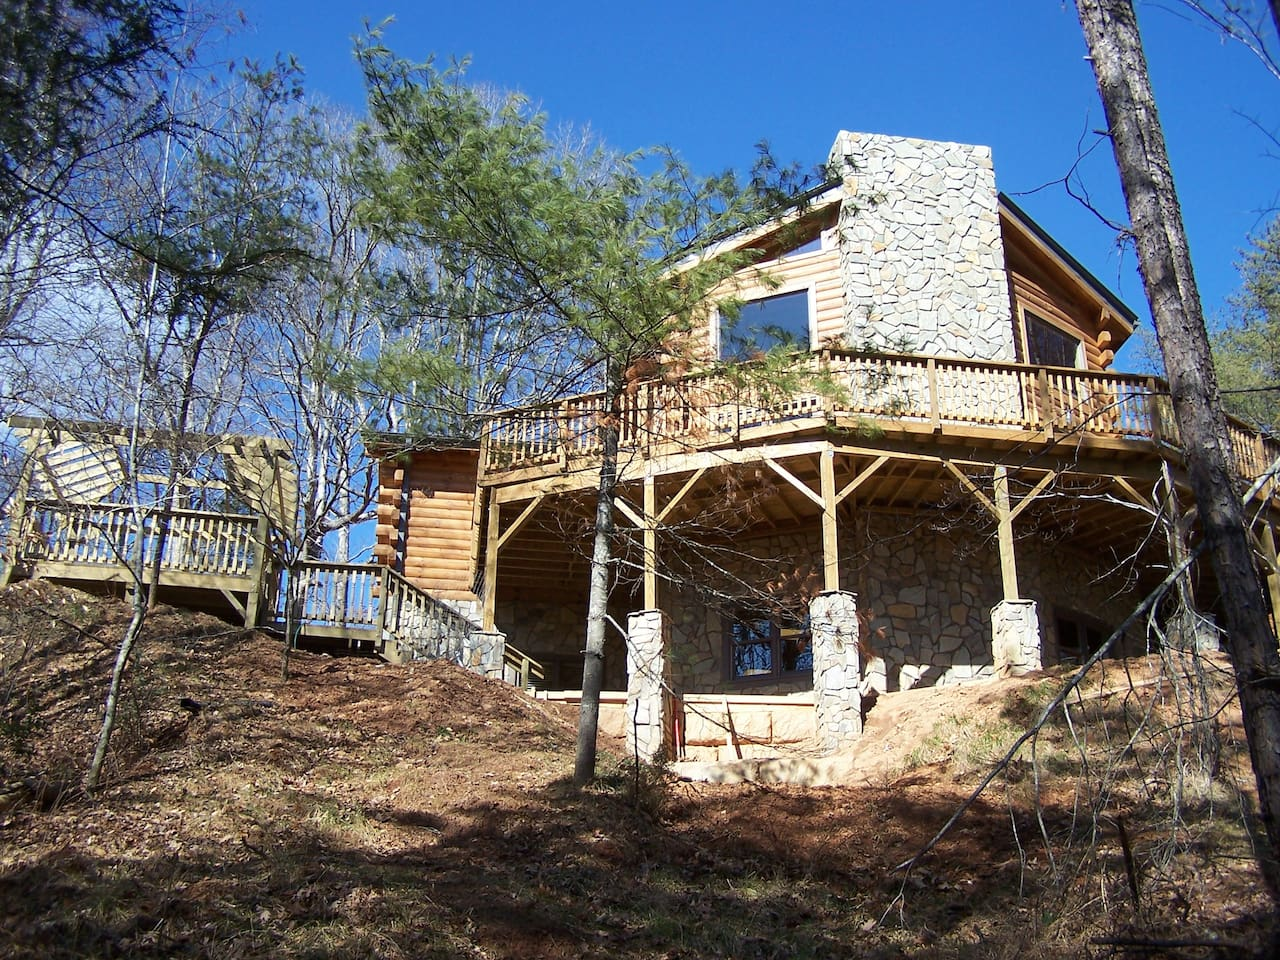 Tatonka Lodge ...enjoy family time making memories around the fire & in the hot tub!